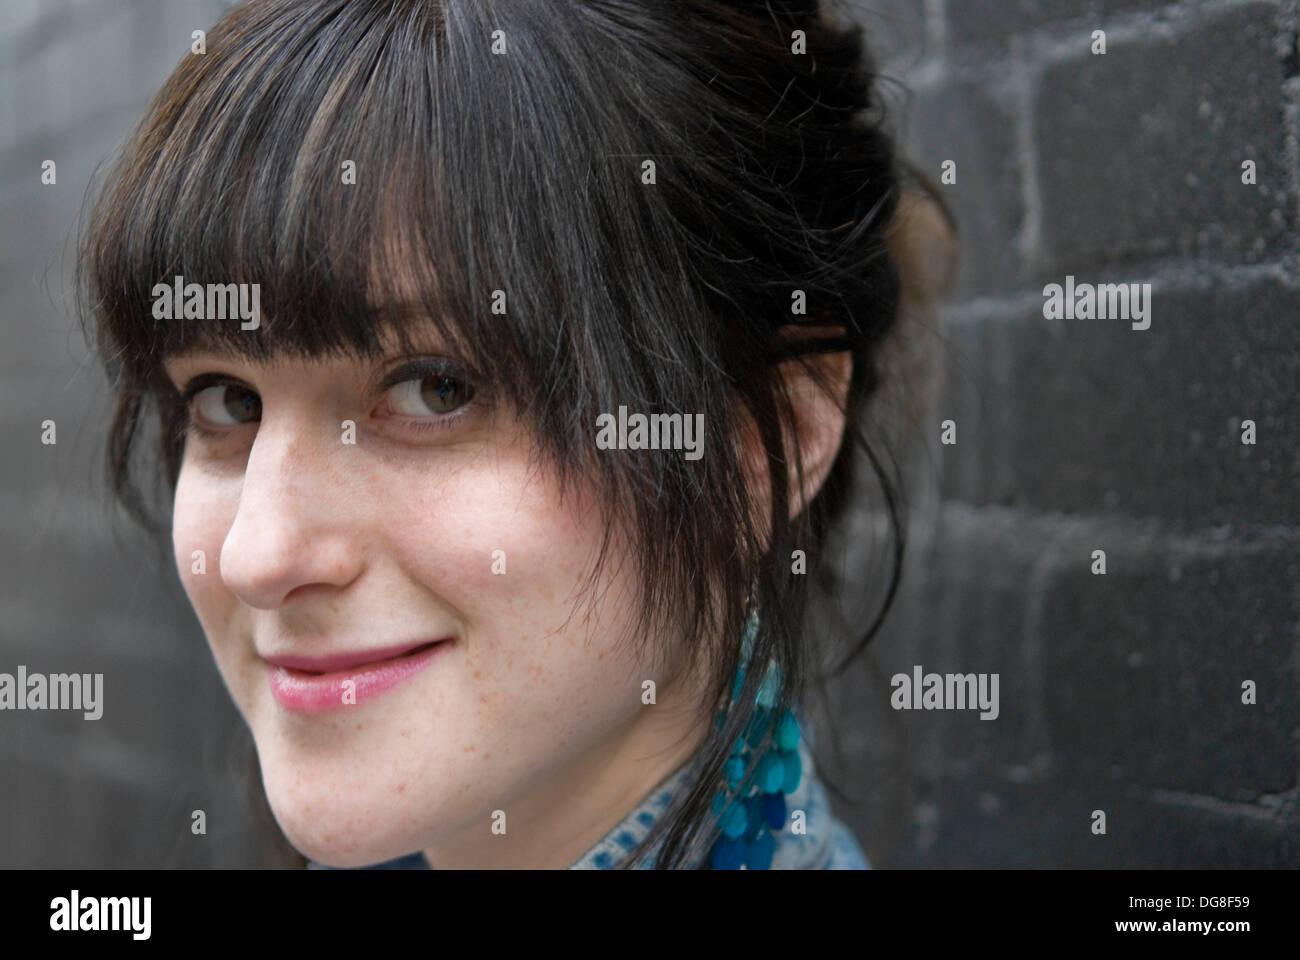 Actress Nadia Kamil - Stock Image